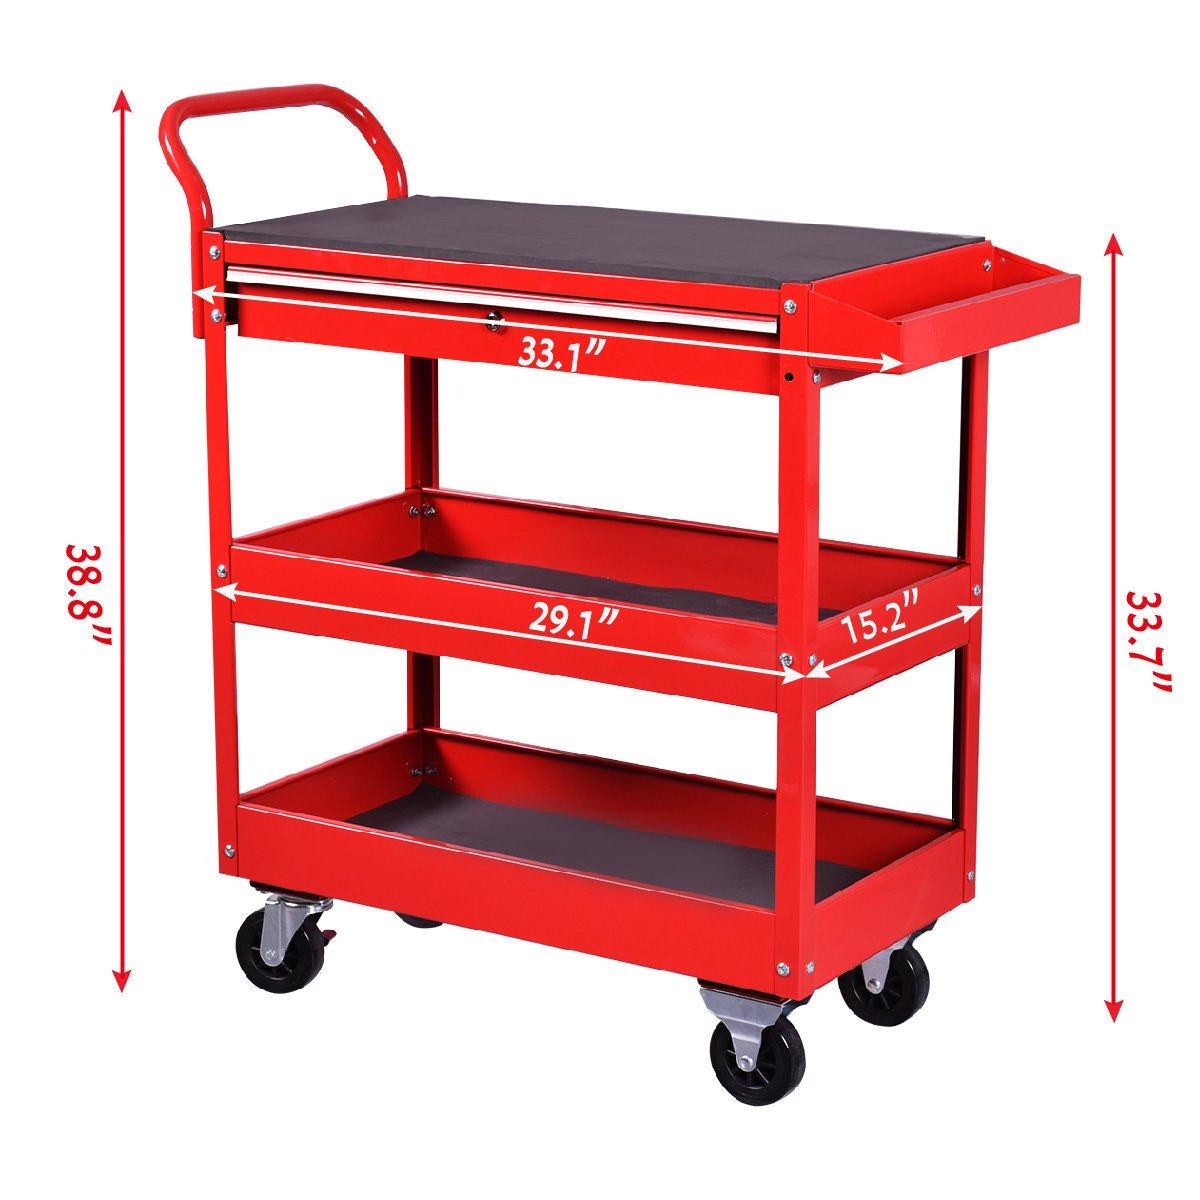 Goplus Tool Cart Rolling 36-Inch Steel Tool Chest Box Wheels Trays w/ Locking Drawer, Red by Goplus (Image #2)